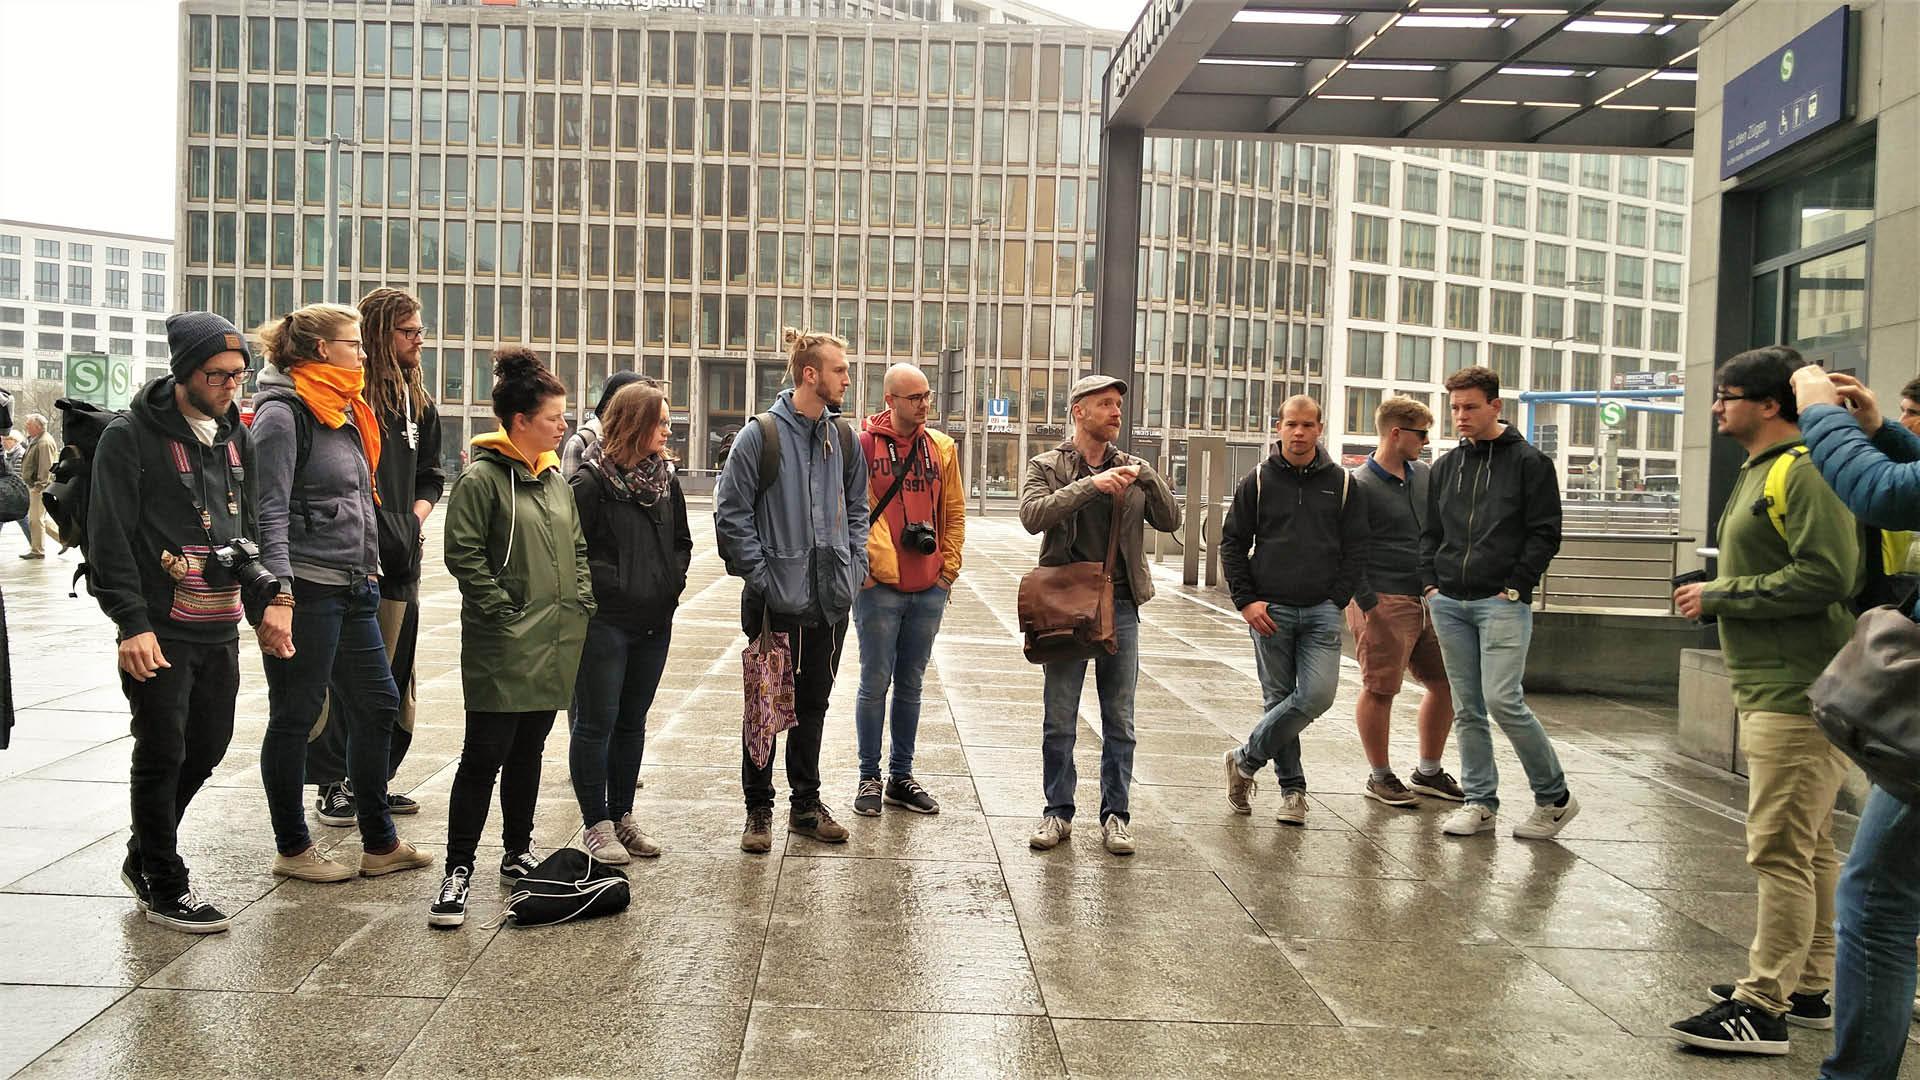 15 18 6 Exkursion Berlin